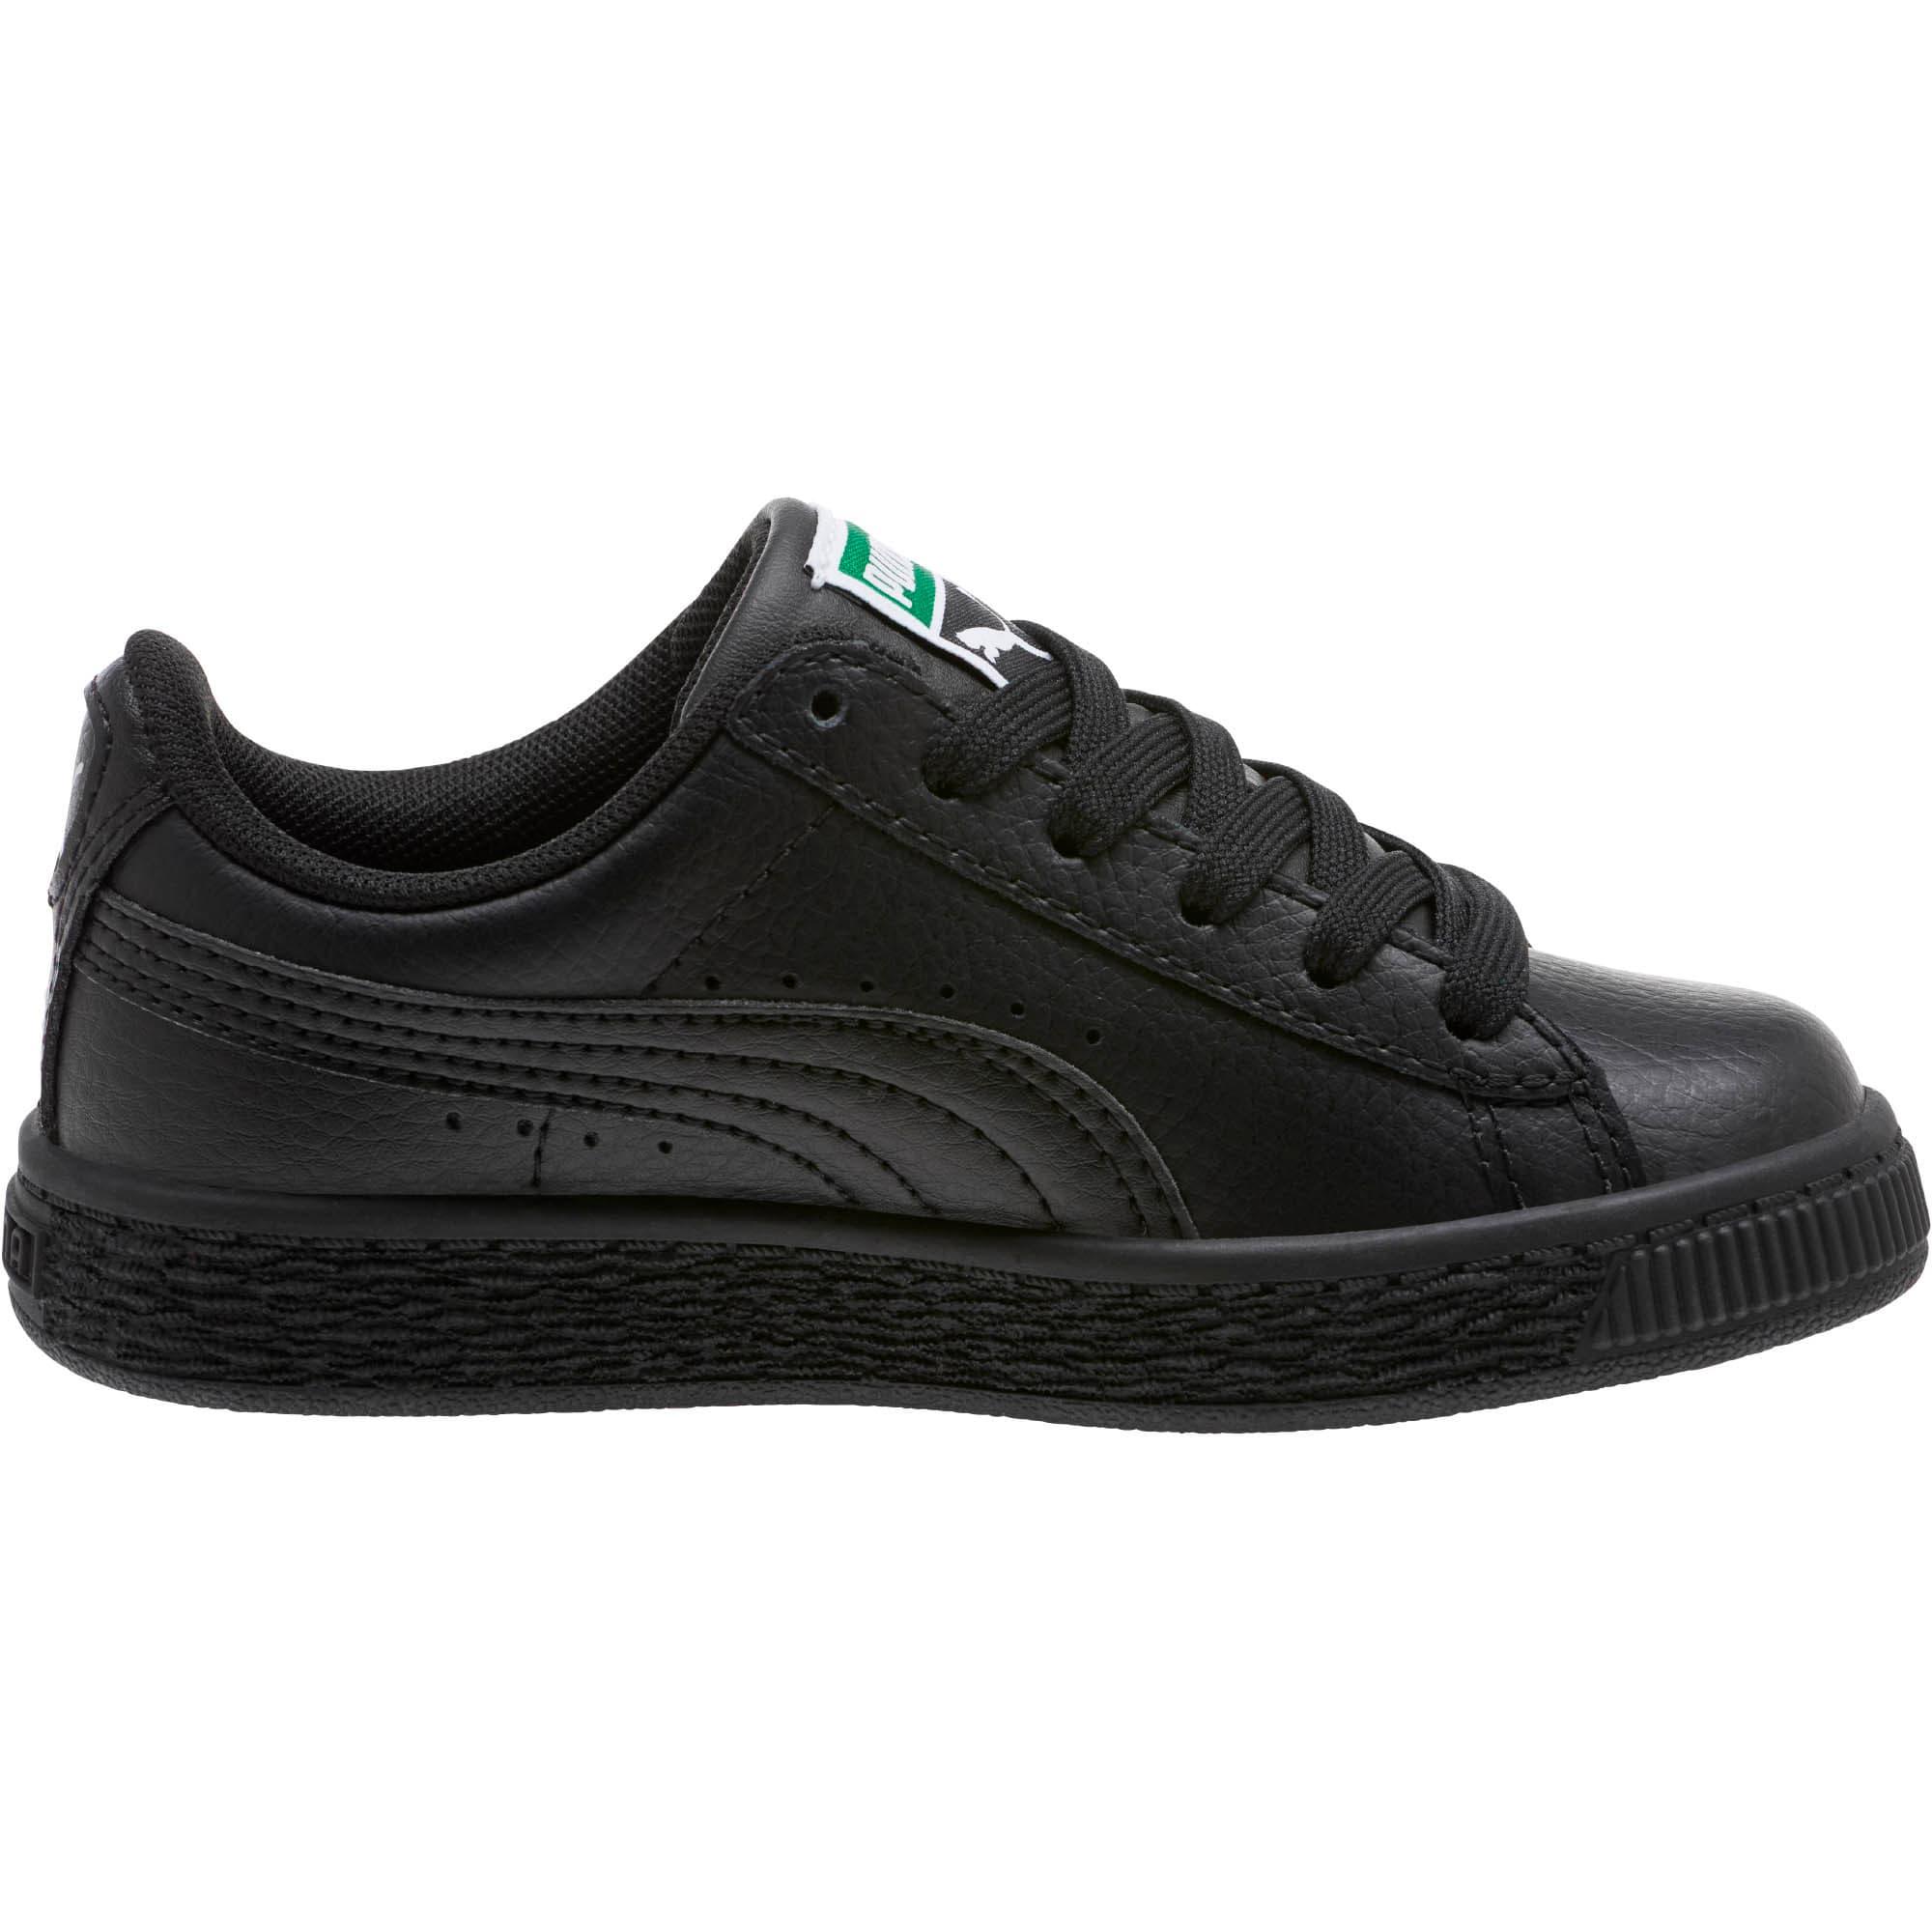 Thumbnail 4 of Basket Classic Little Kids' Shoes, Puma Black-Puma Black, medium